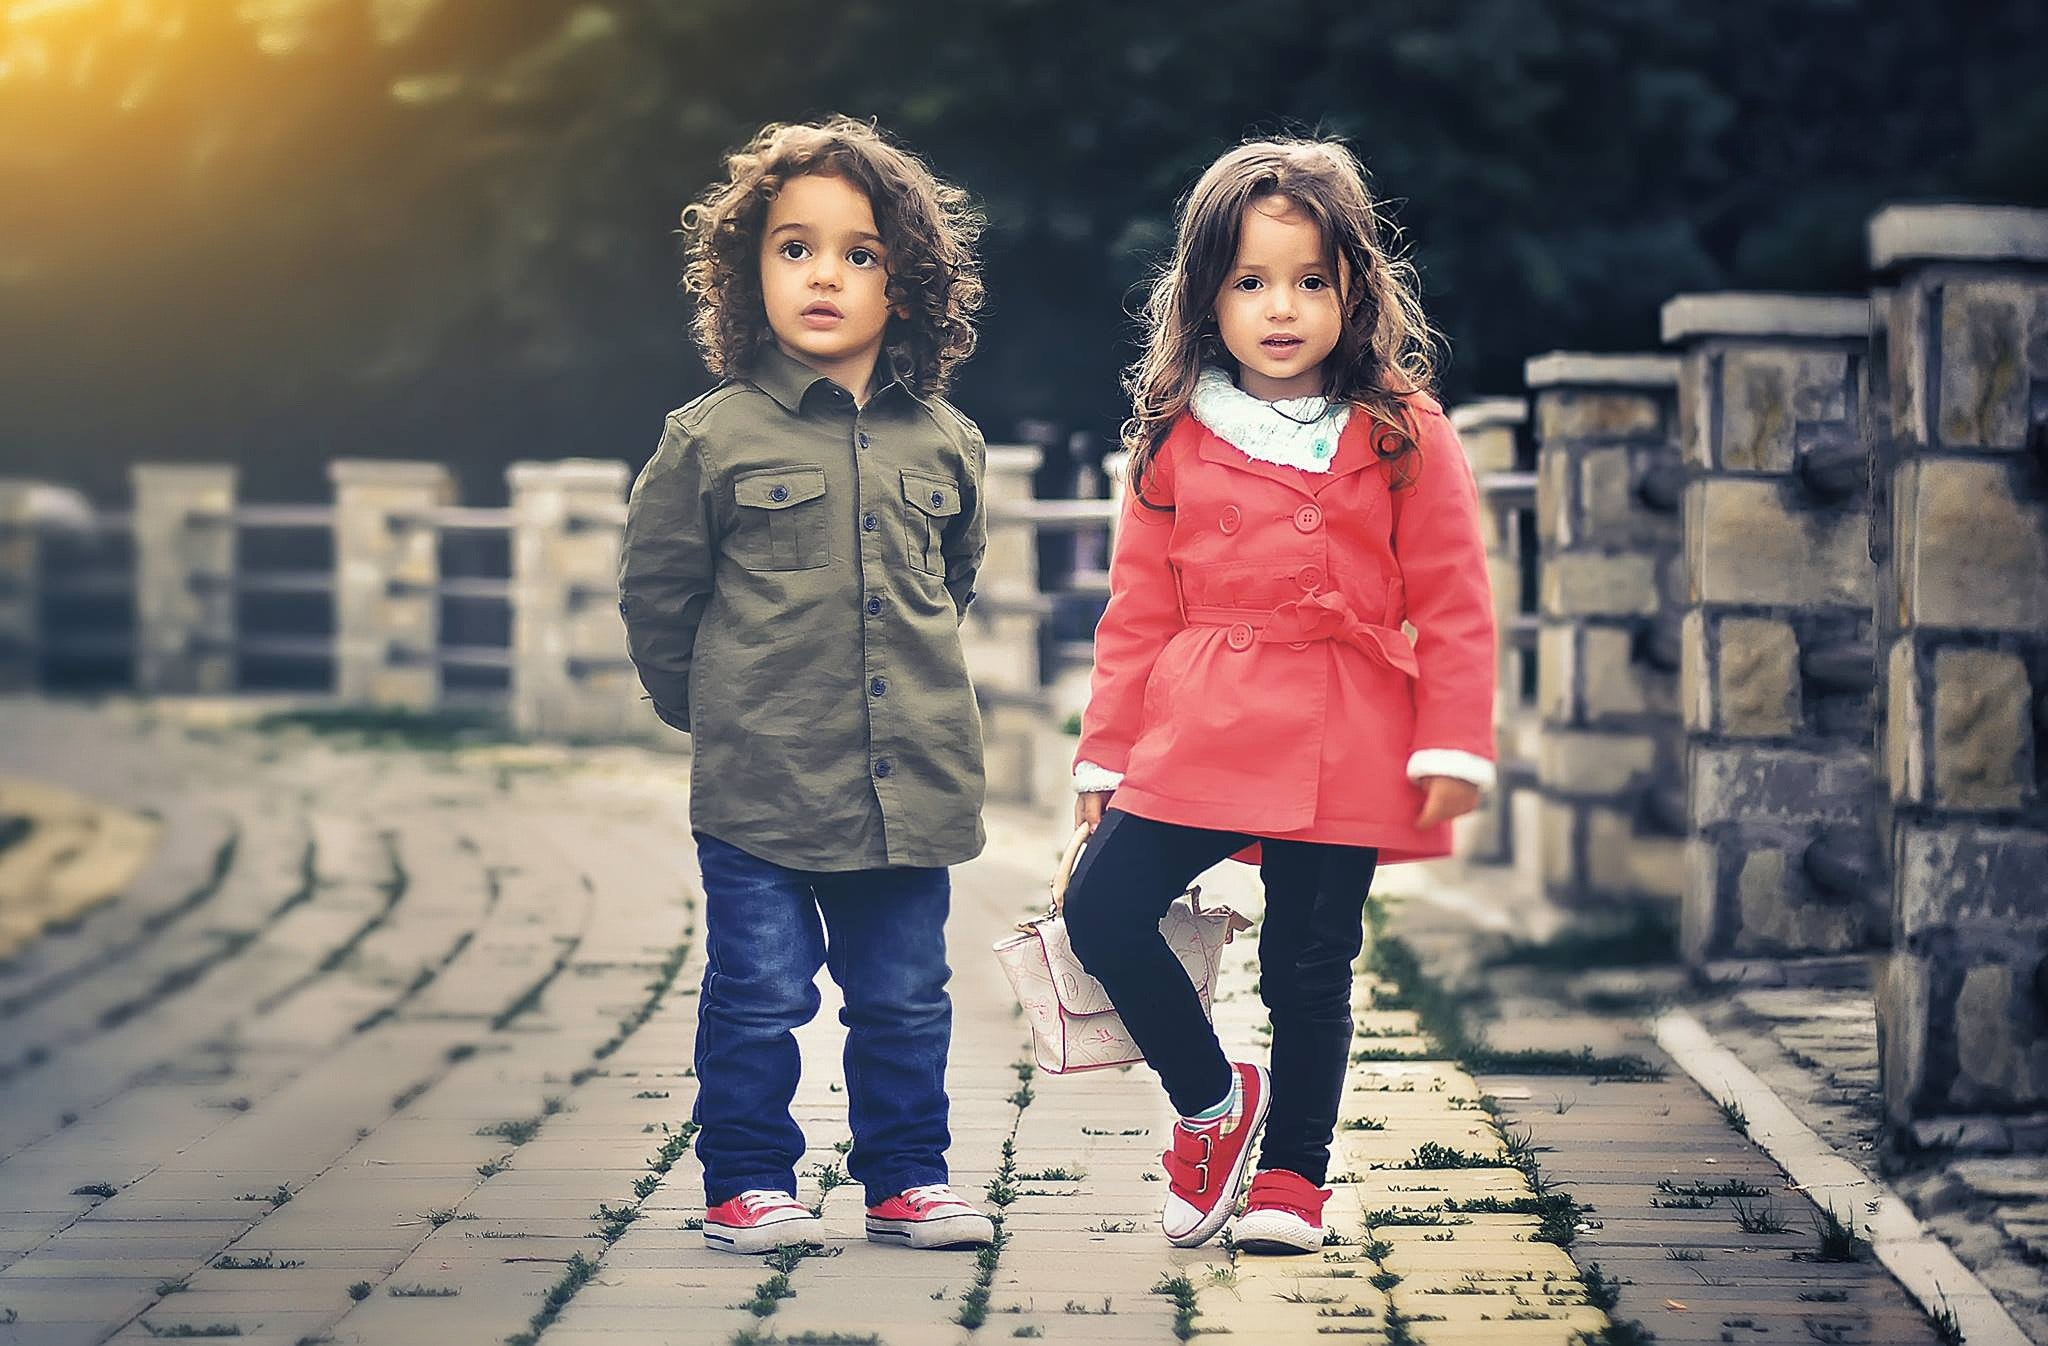 To barn med røde sko